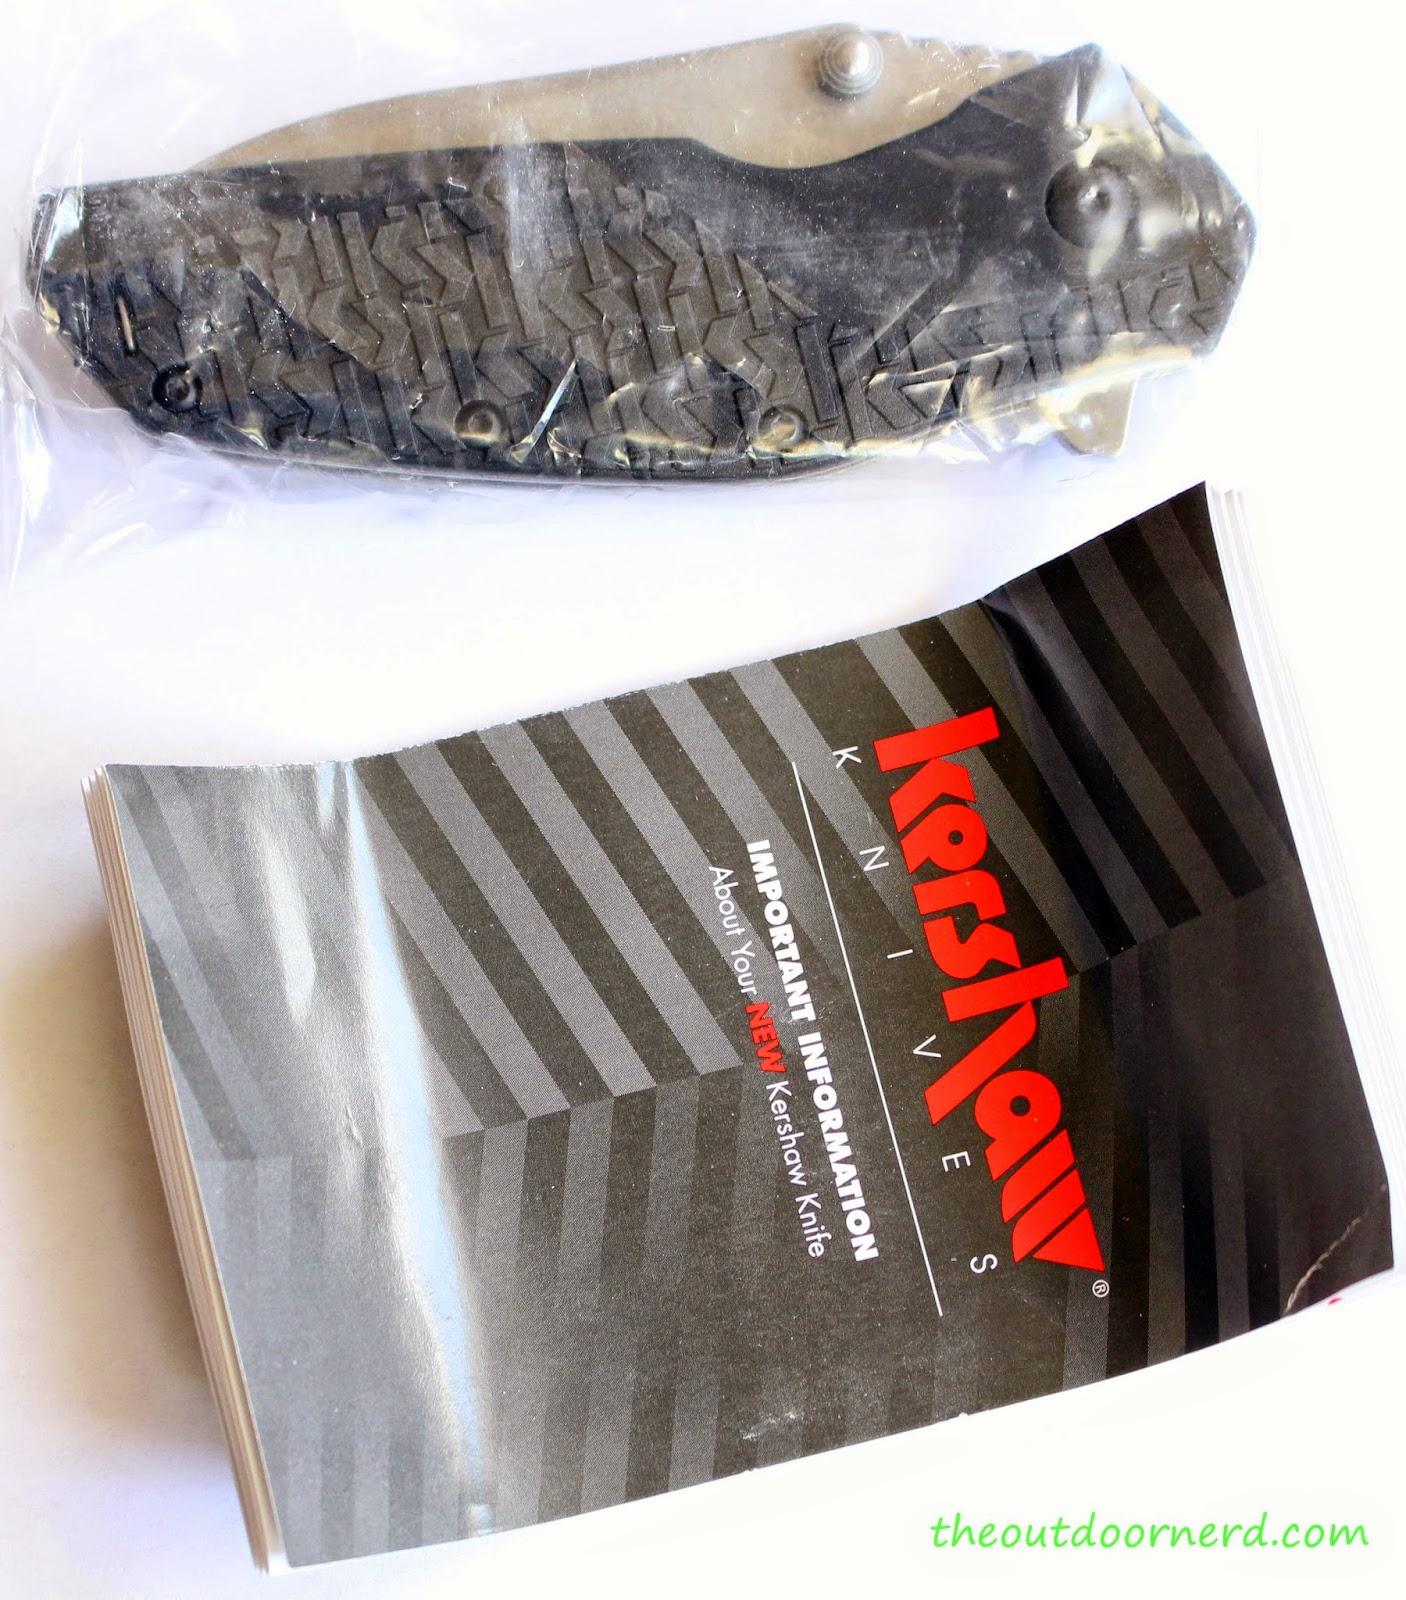 Kershaw Swerve EDC Pocket Knife:  In Box 3